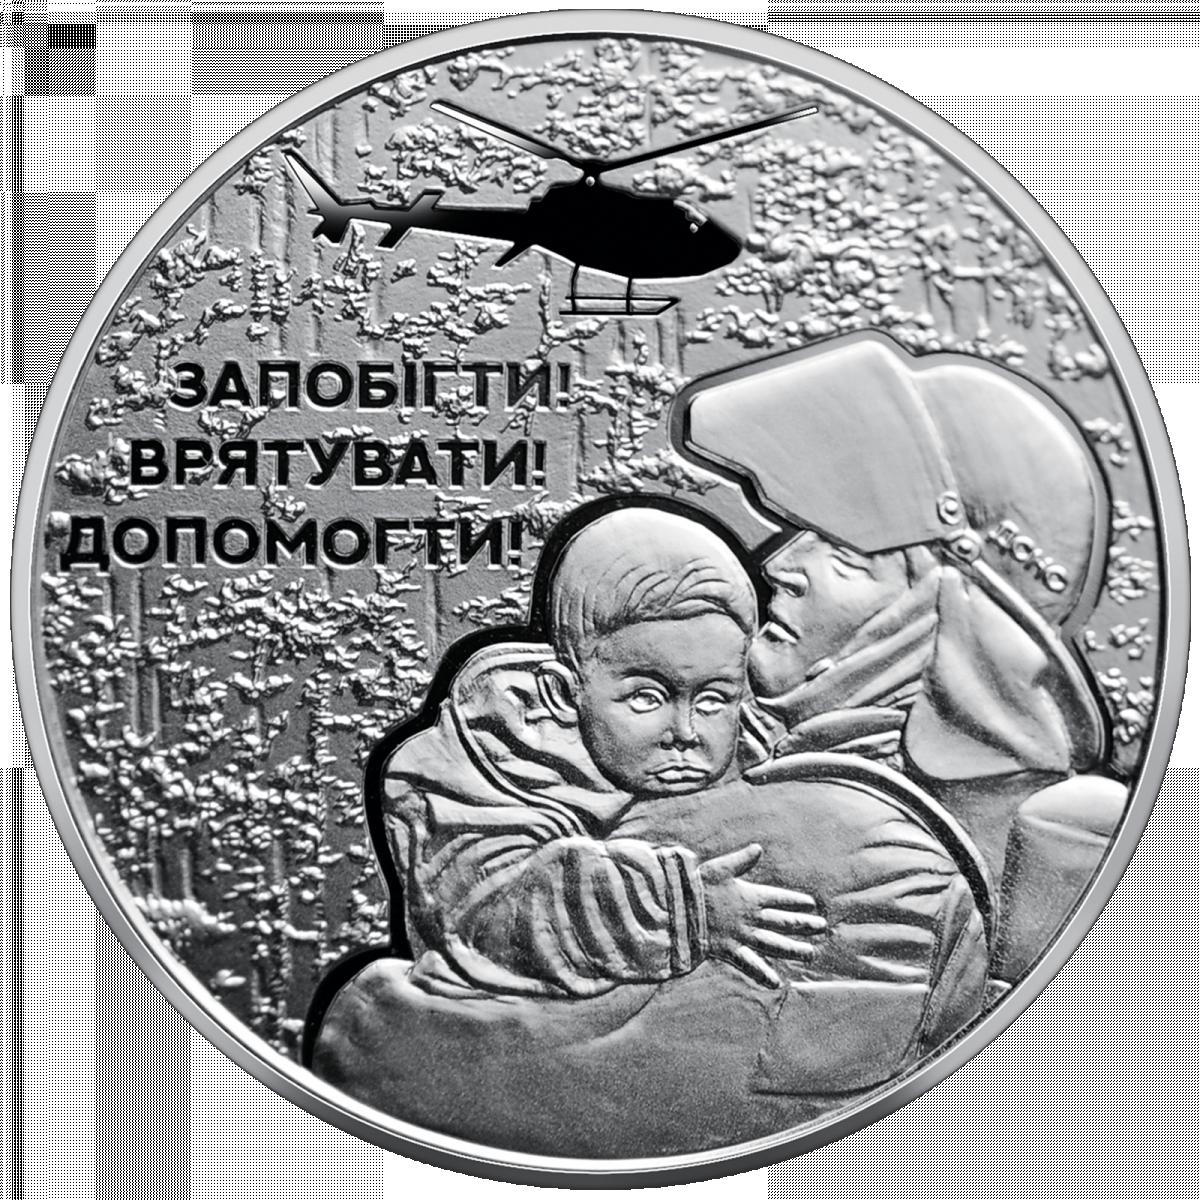 Реверс нової монети / фото прес-служба НБУ